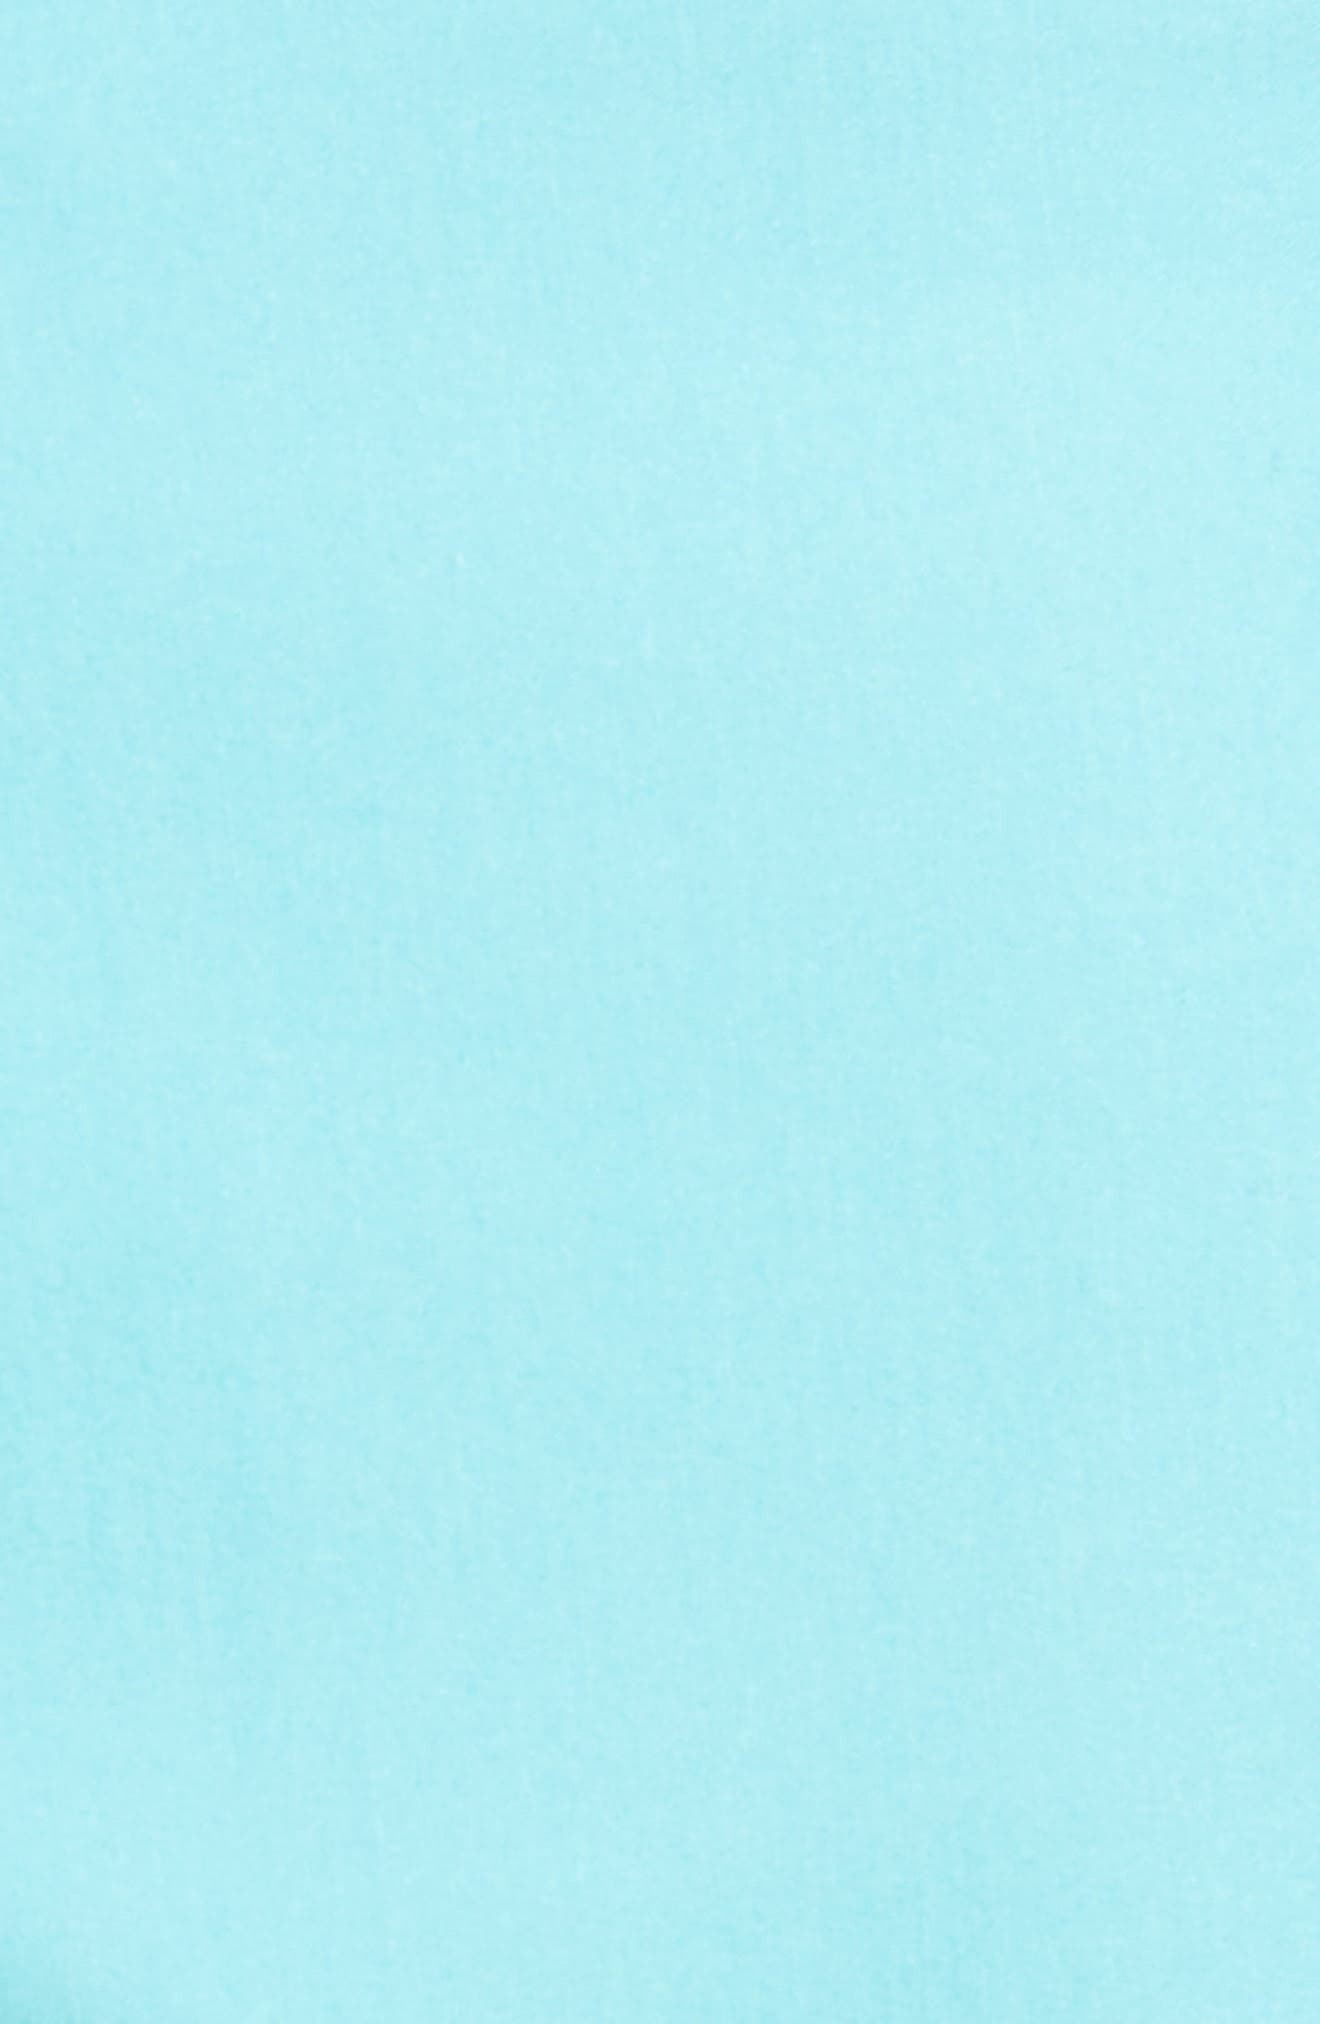 Mirage Owen Stretch Board Shorts,                             Alternate thumbnail 5, color,                             Aqua